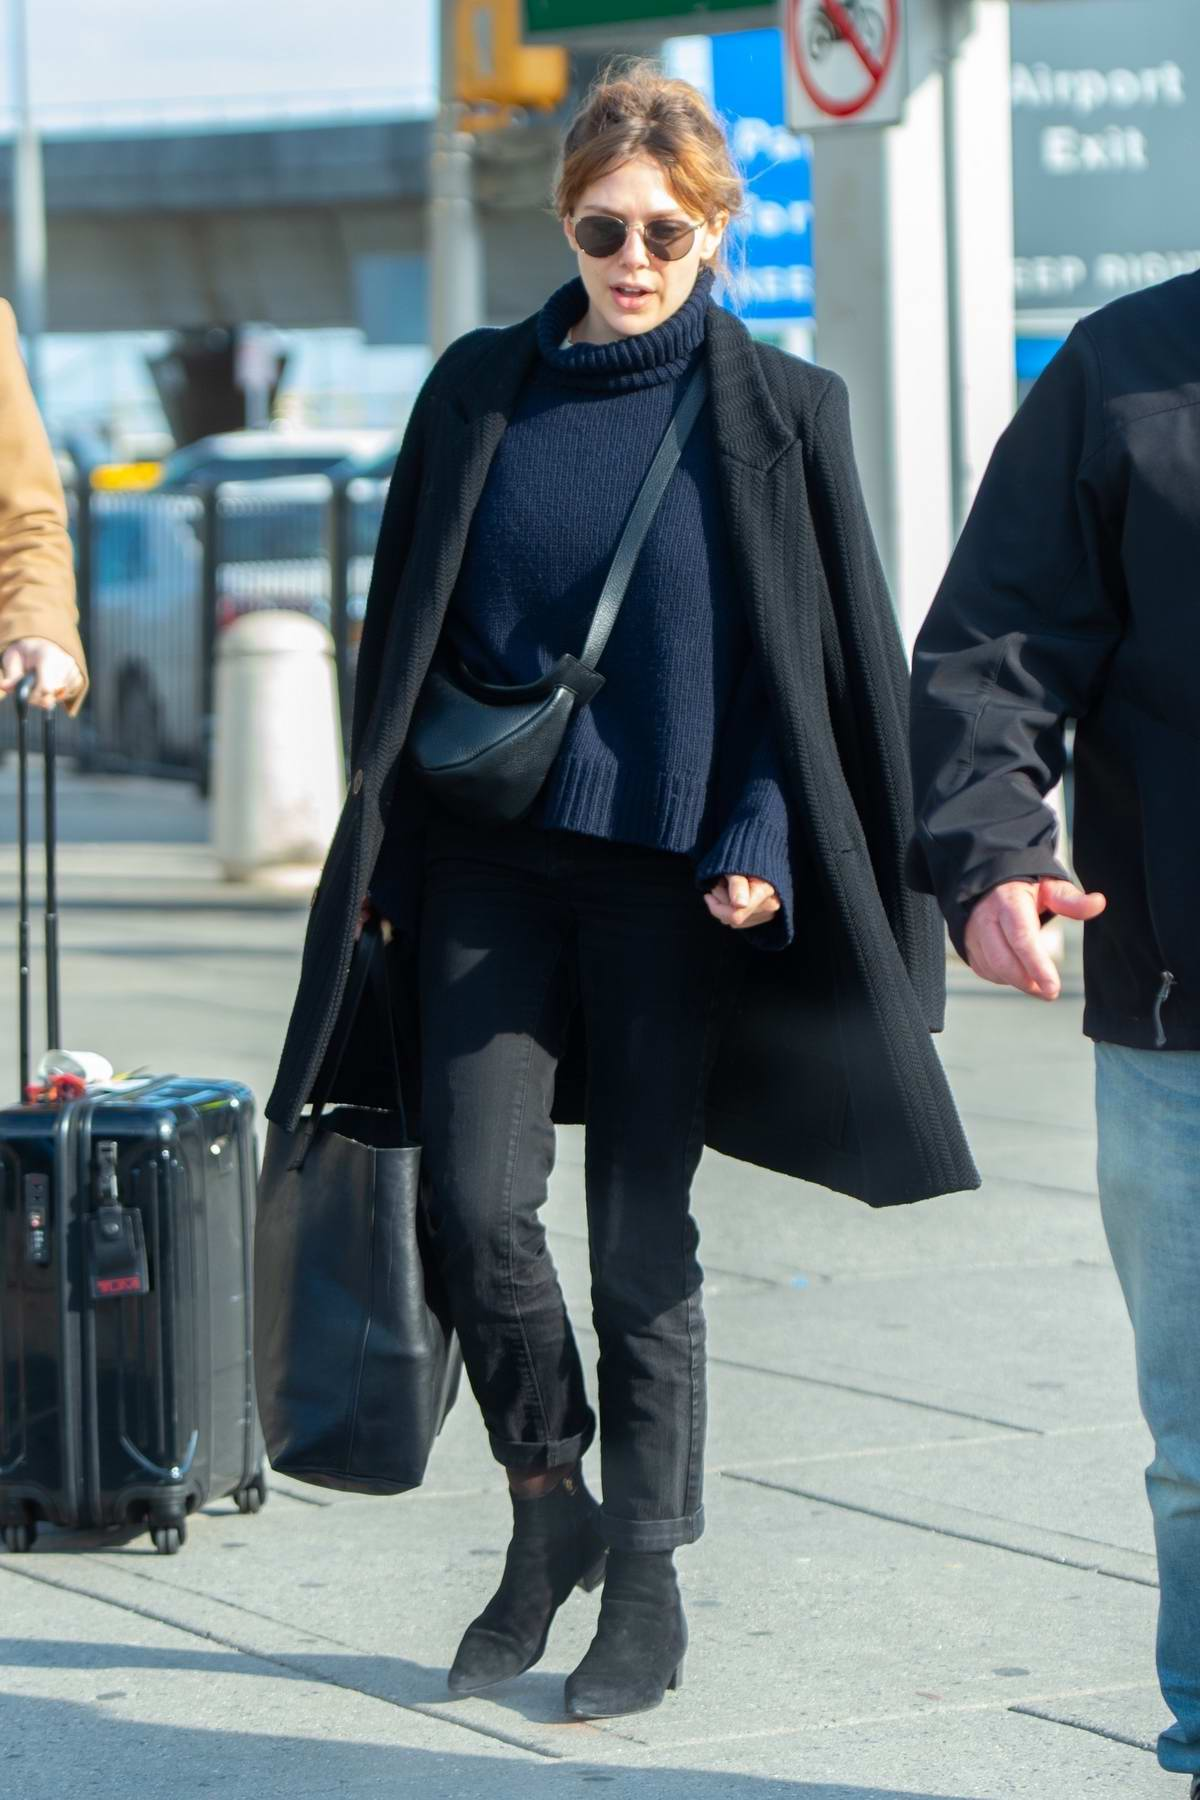 Elizabeth Olsen bundles up as she arrives at JFK airport to jet out of New York City